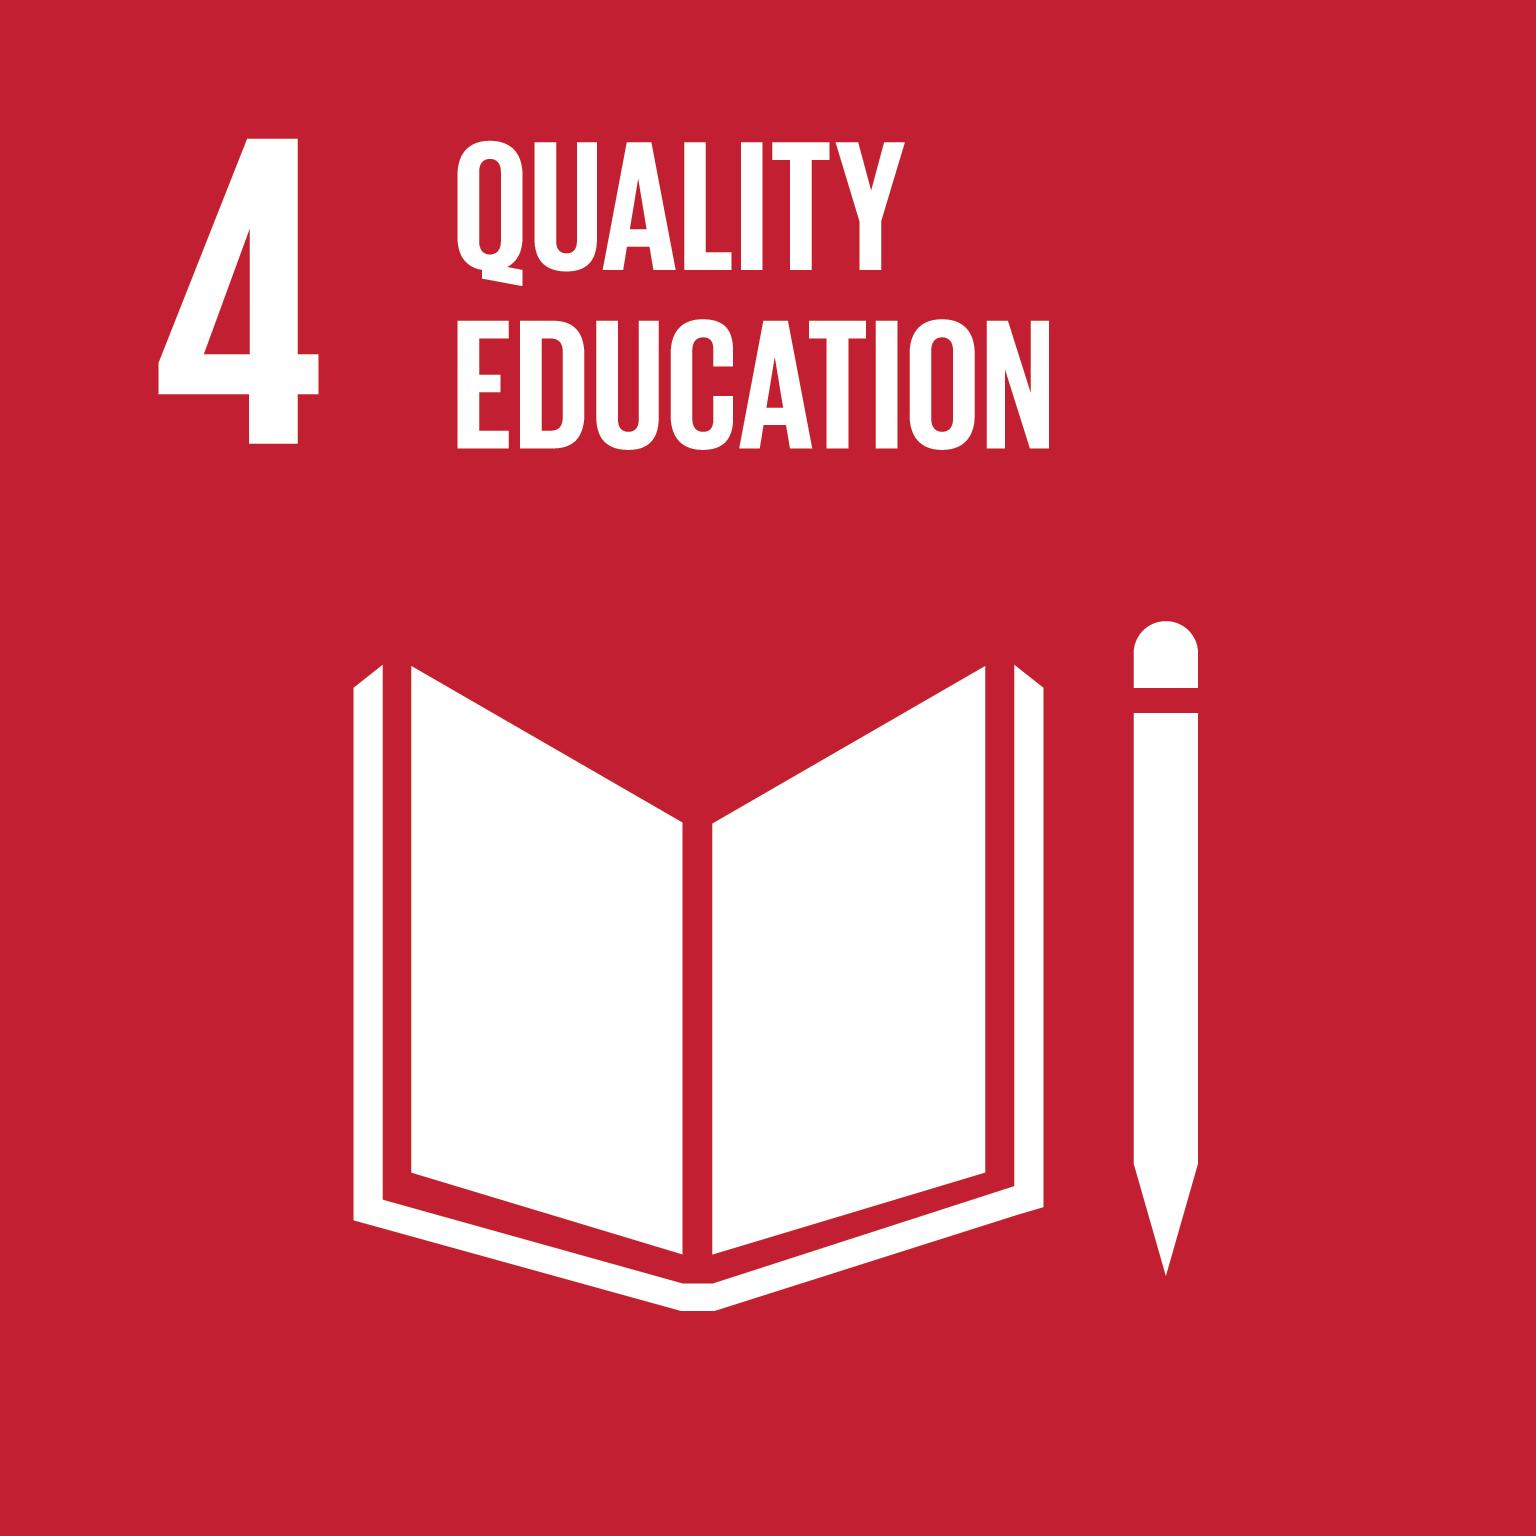 E_SDG4 goals_icons-individual-rgb-04-unesco